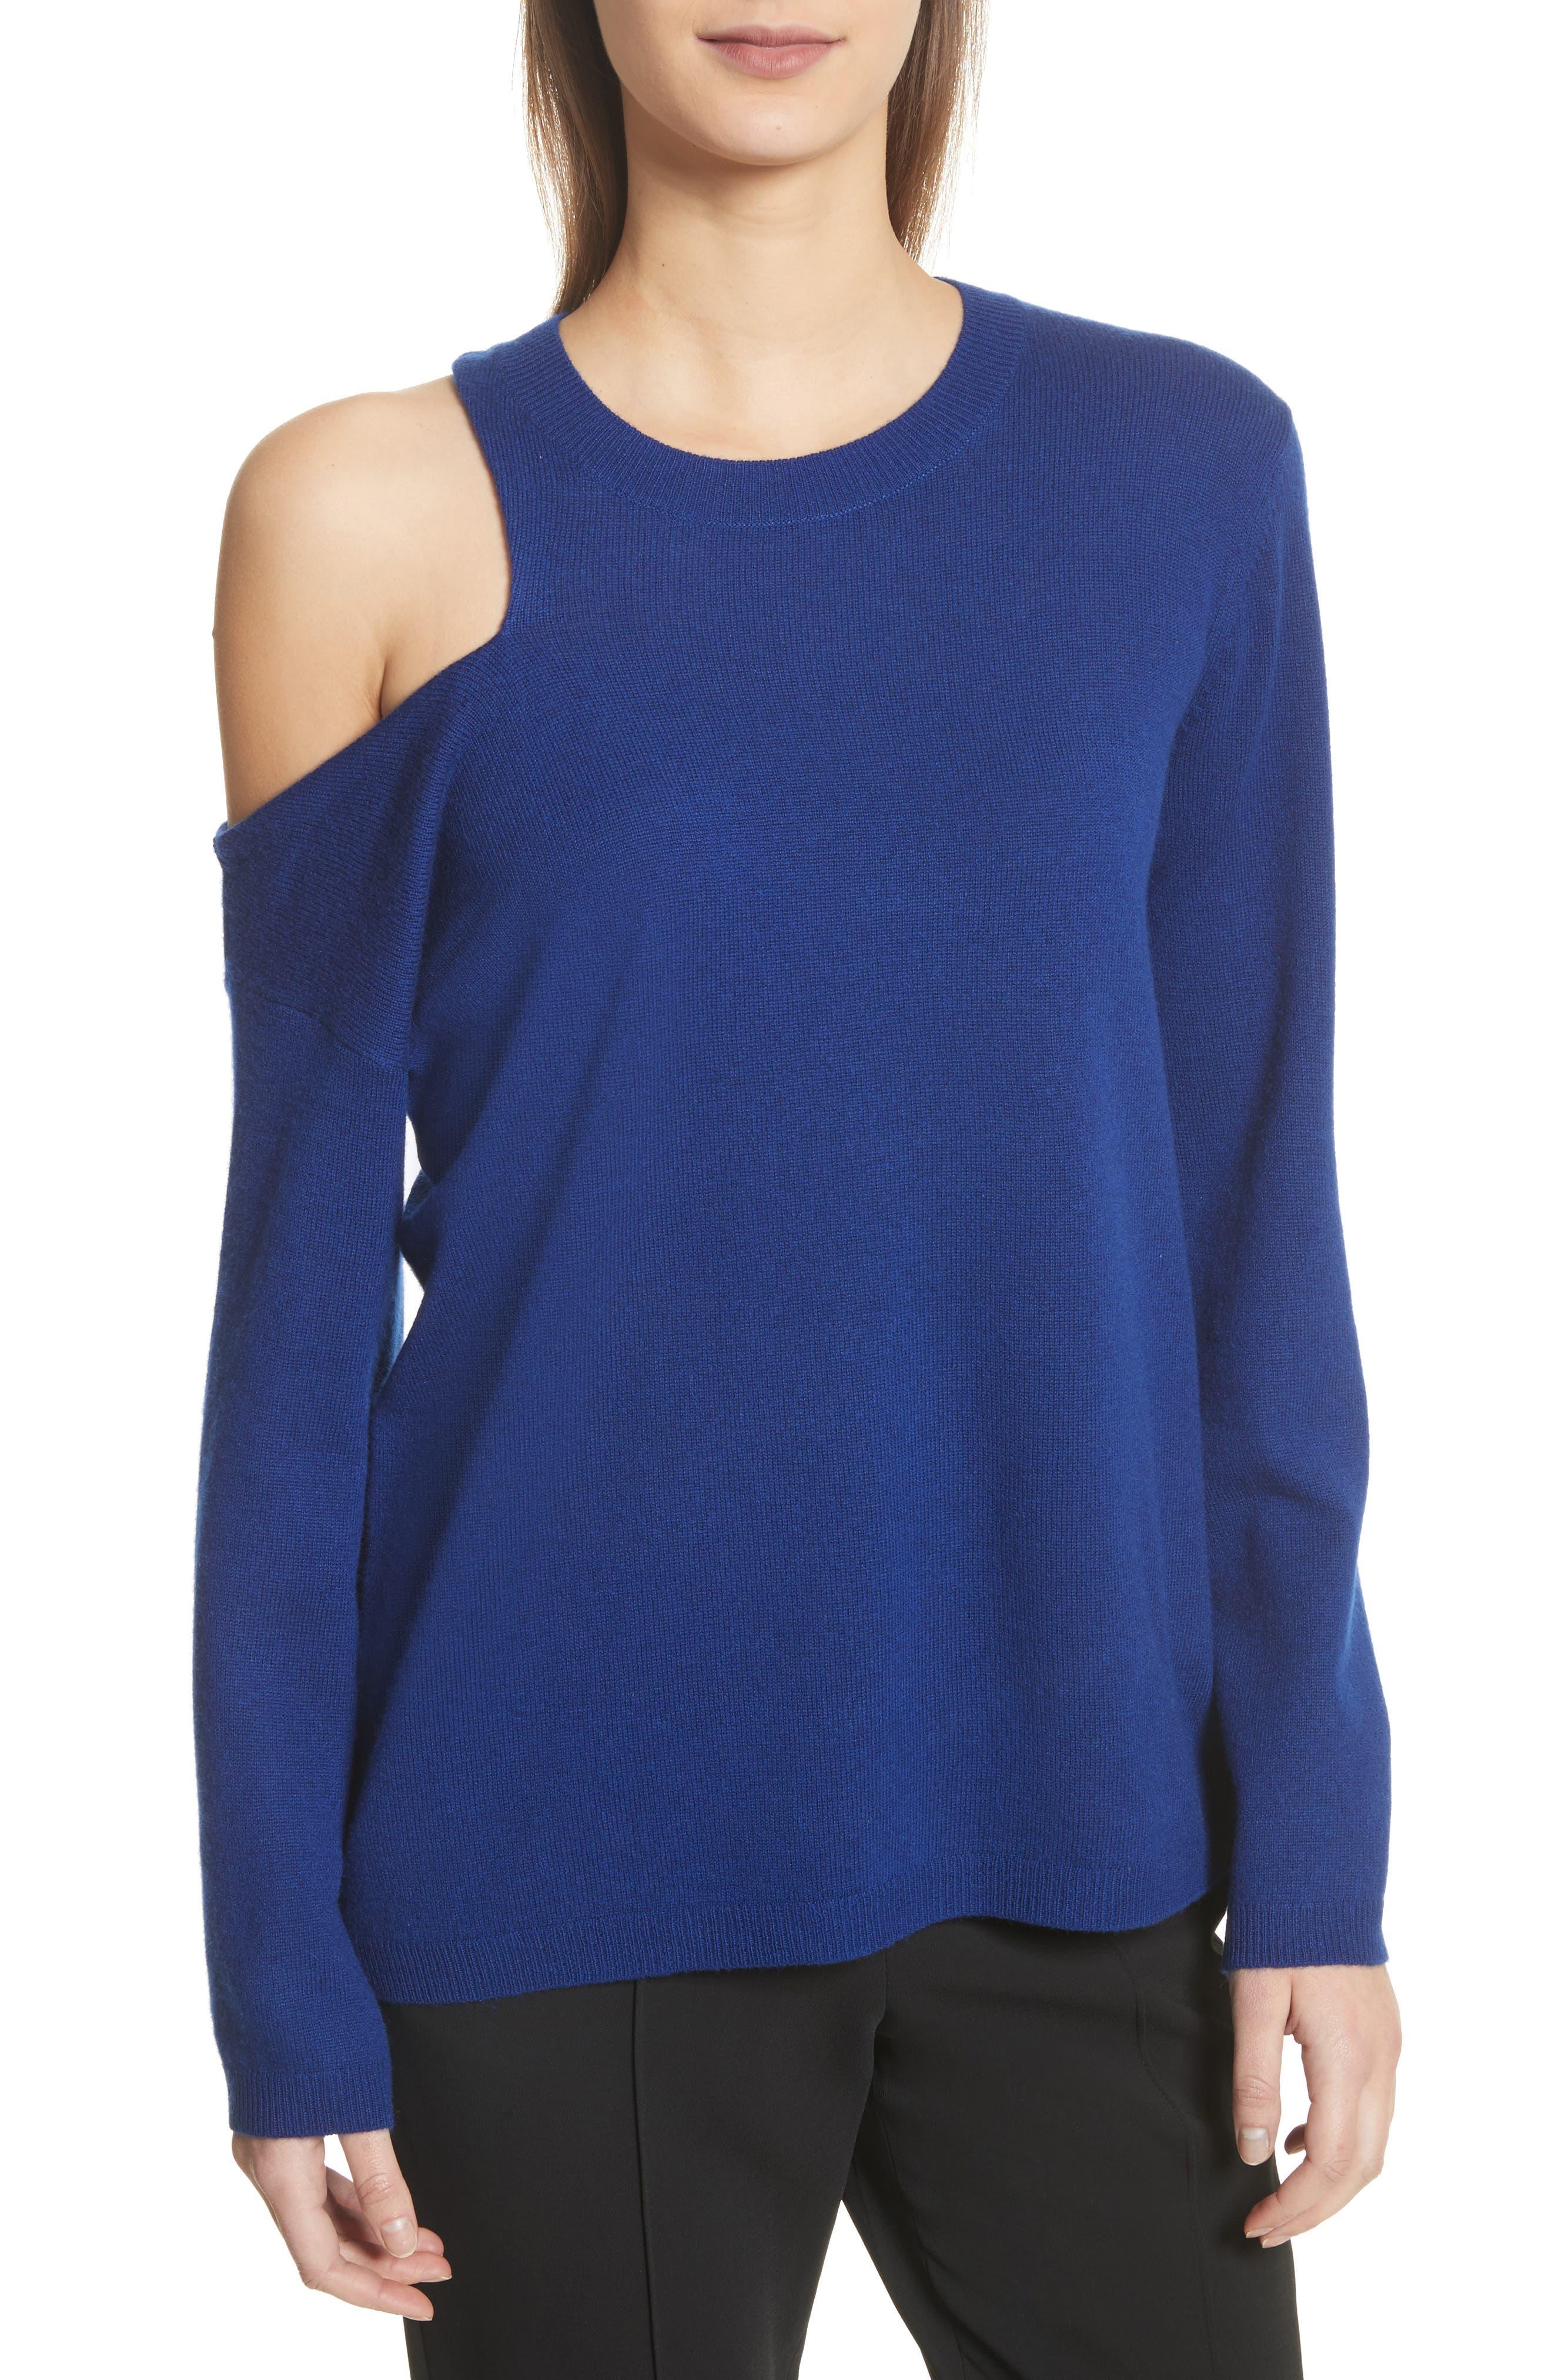 Hamilton Wool & Cashmere Sweater,                         Main,                         color, Deep Cobalt